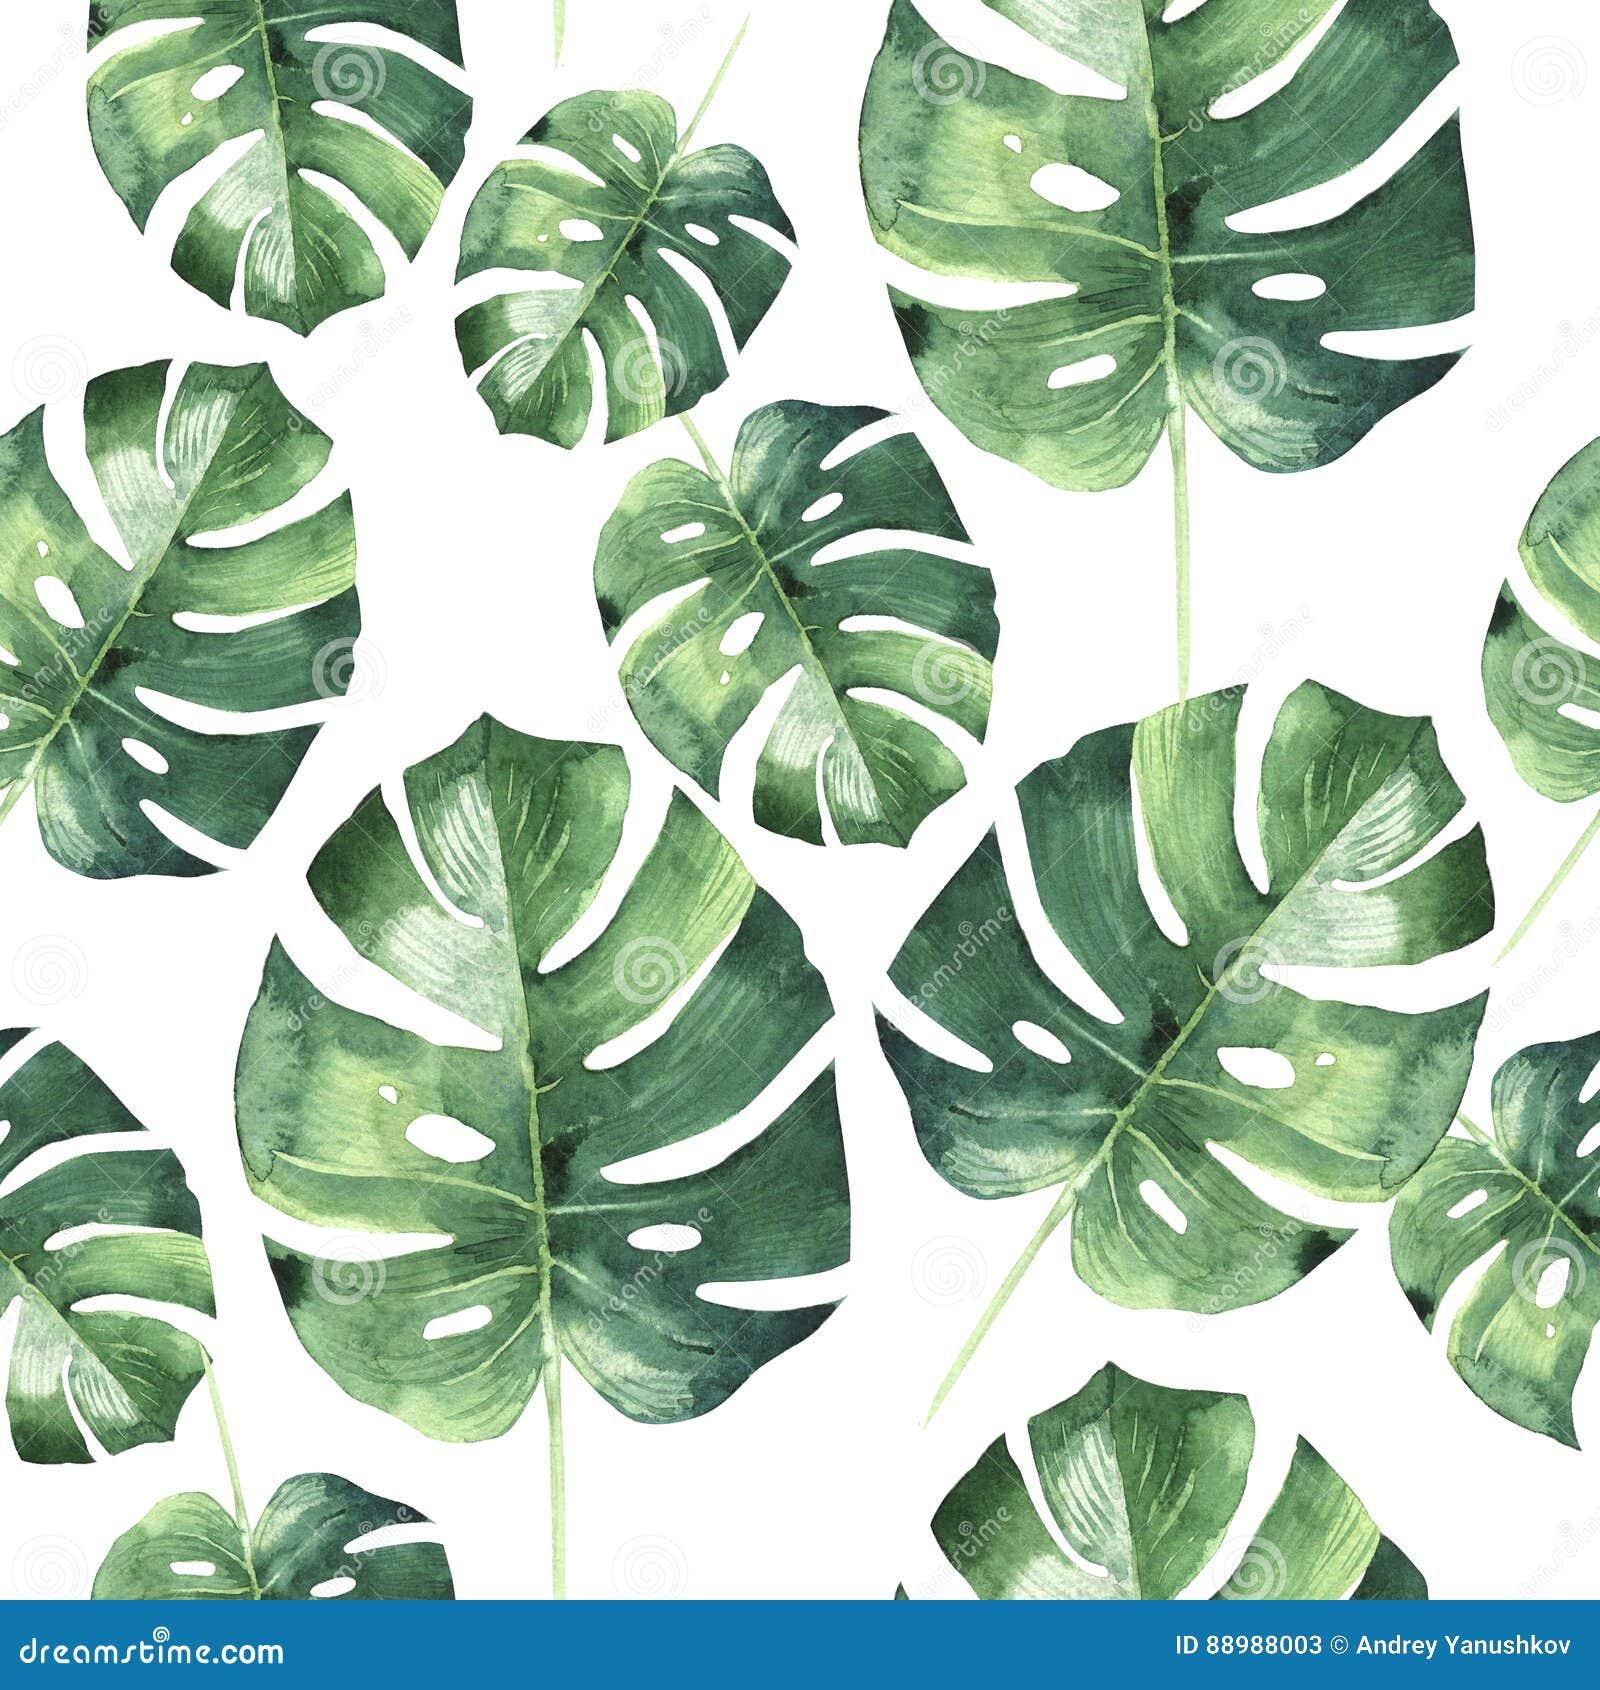 Tropical Hawaii Leaves Palm Tree Pattern In A Watercolor ...  Hawaiian Palm Tree Drawings